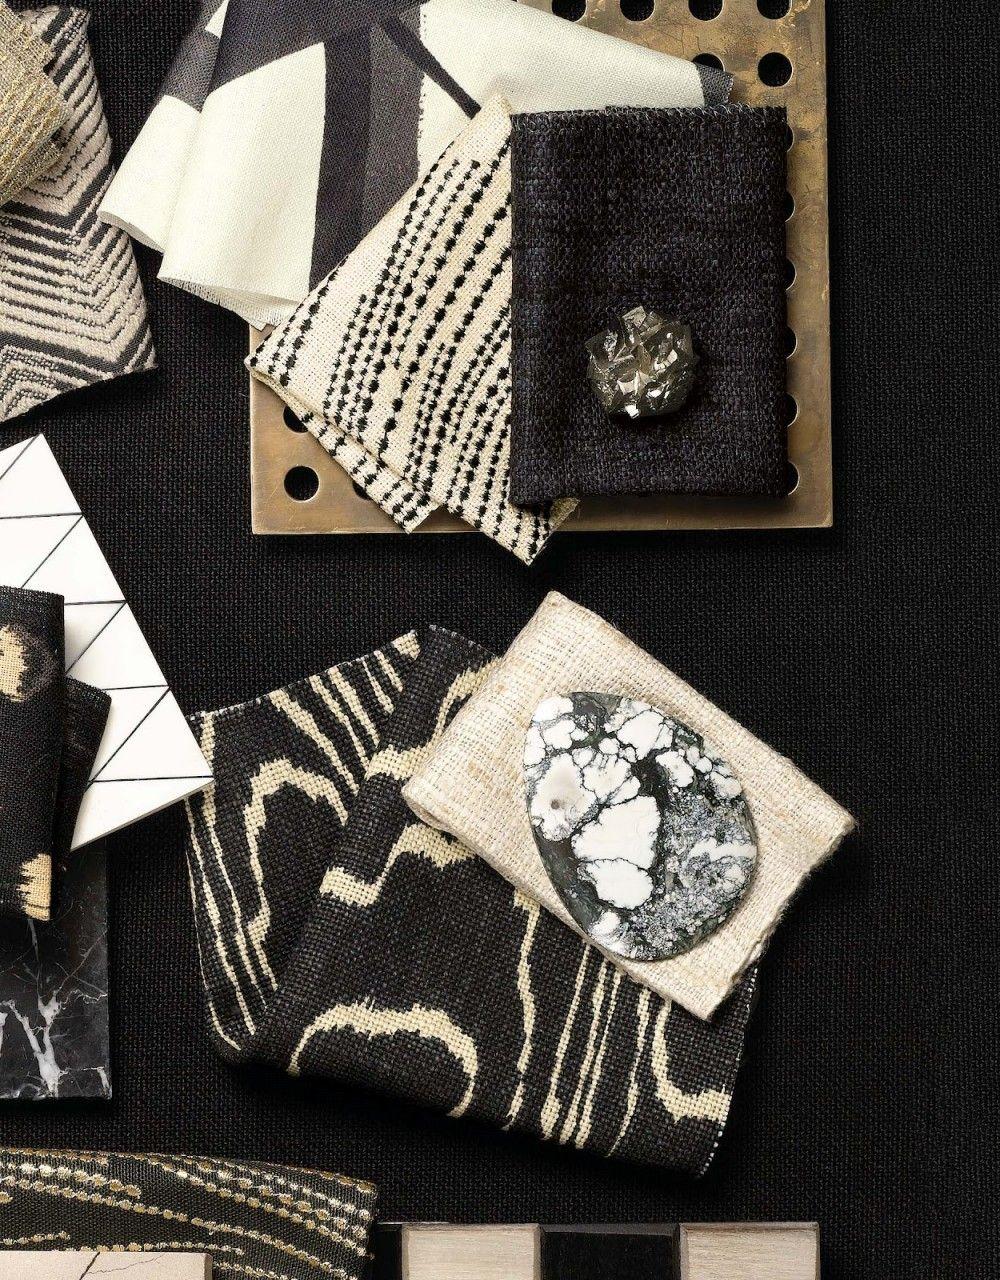 Kelly Wearstler - Background: Sunbleached-Ebony. Top left: Tempest-Truffle, Channels-Ebony/Ivory, Currents Silk-Ebony/Oatmeal, Sonoma-Ebony, Sonoma-Oatmeal, Agate-Ebony/Beige, Currents Linen-Ebony/Gold, Sunbleached-Ebony